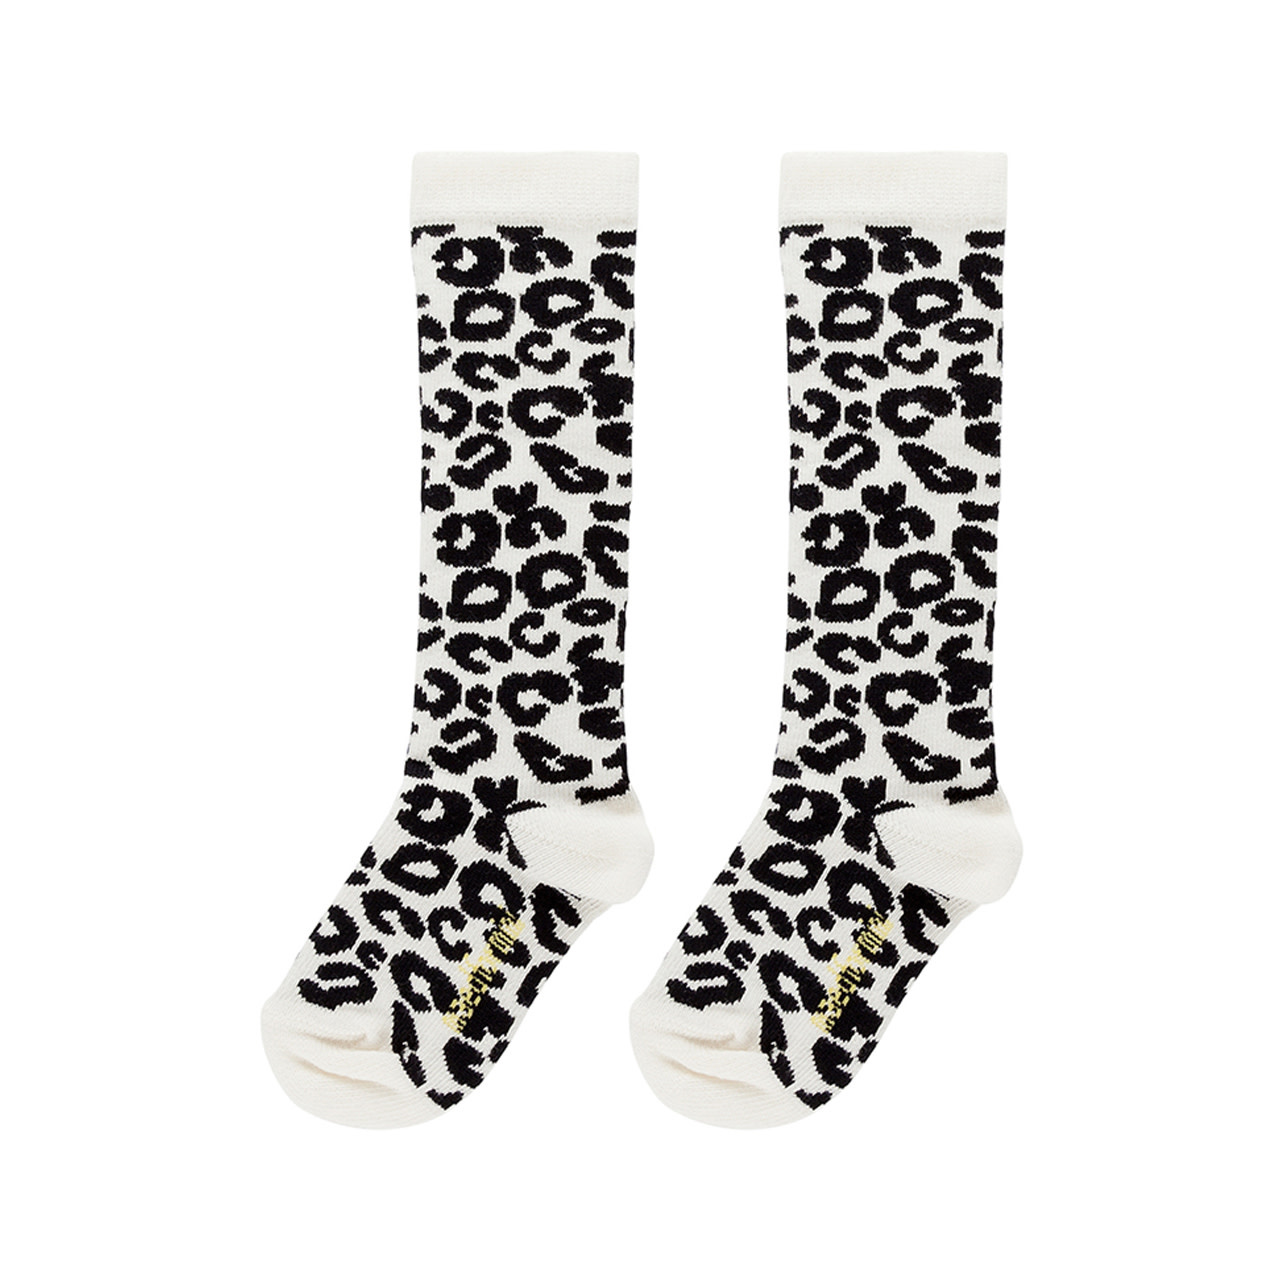 Maed For mini Maed for mini - Knee socks white leopard aop